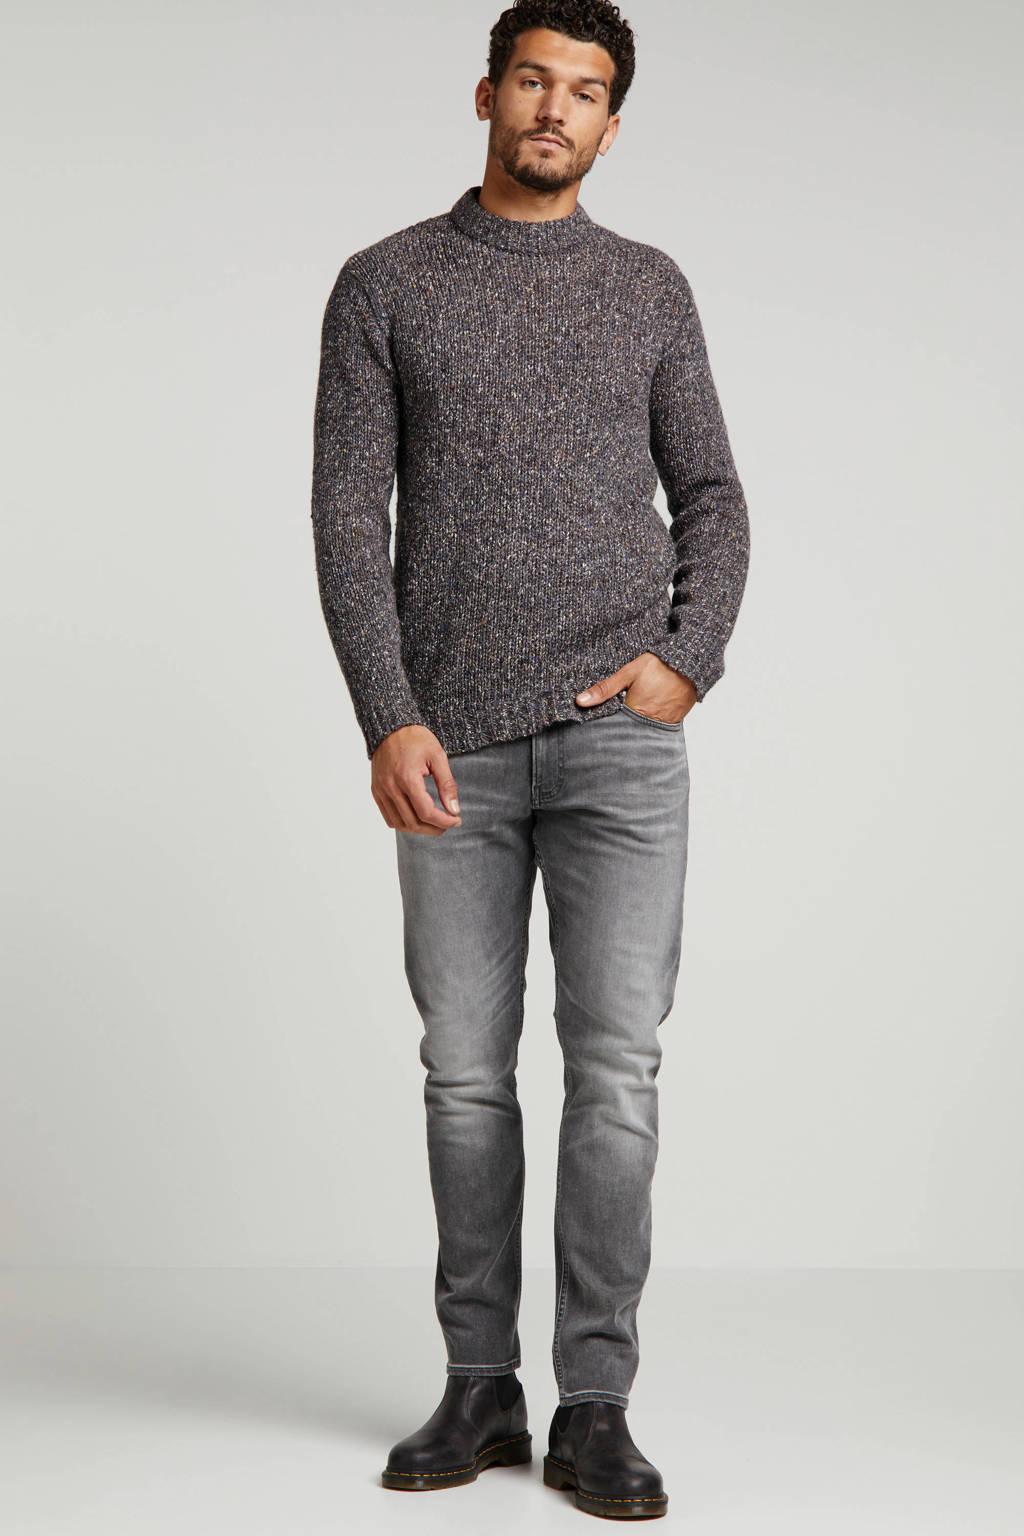 CALVIN KLEIN JEANS slim fit jeans 26 911 ba162 grey, 911 BA162 Grey